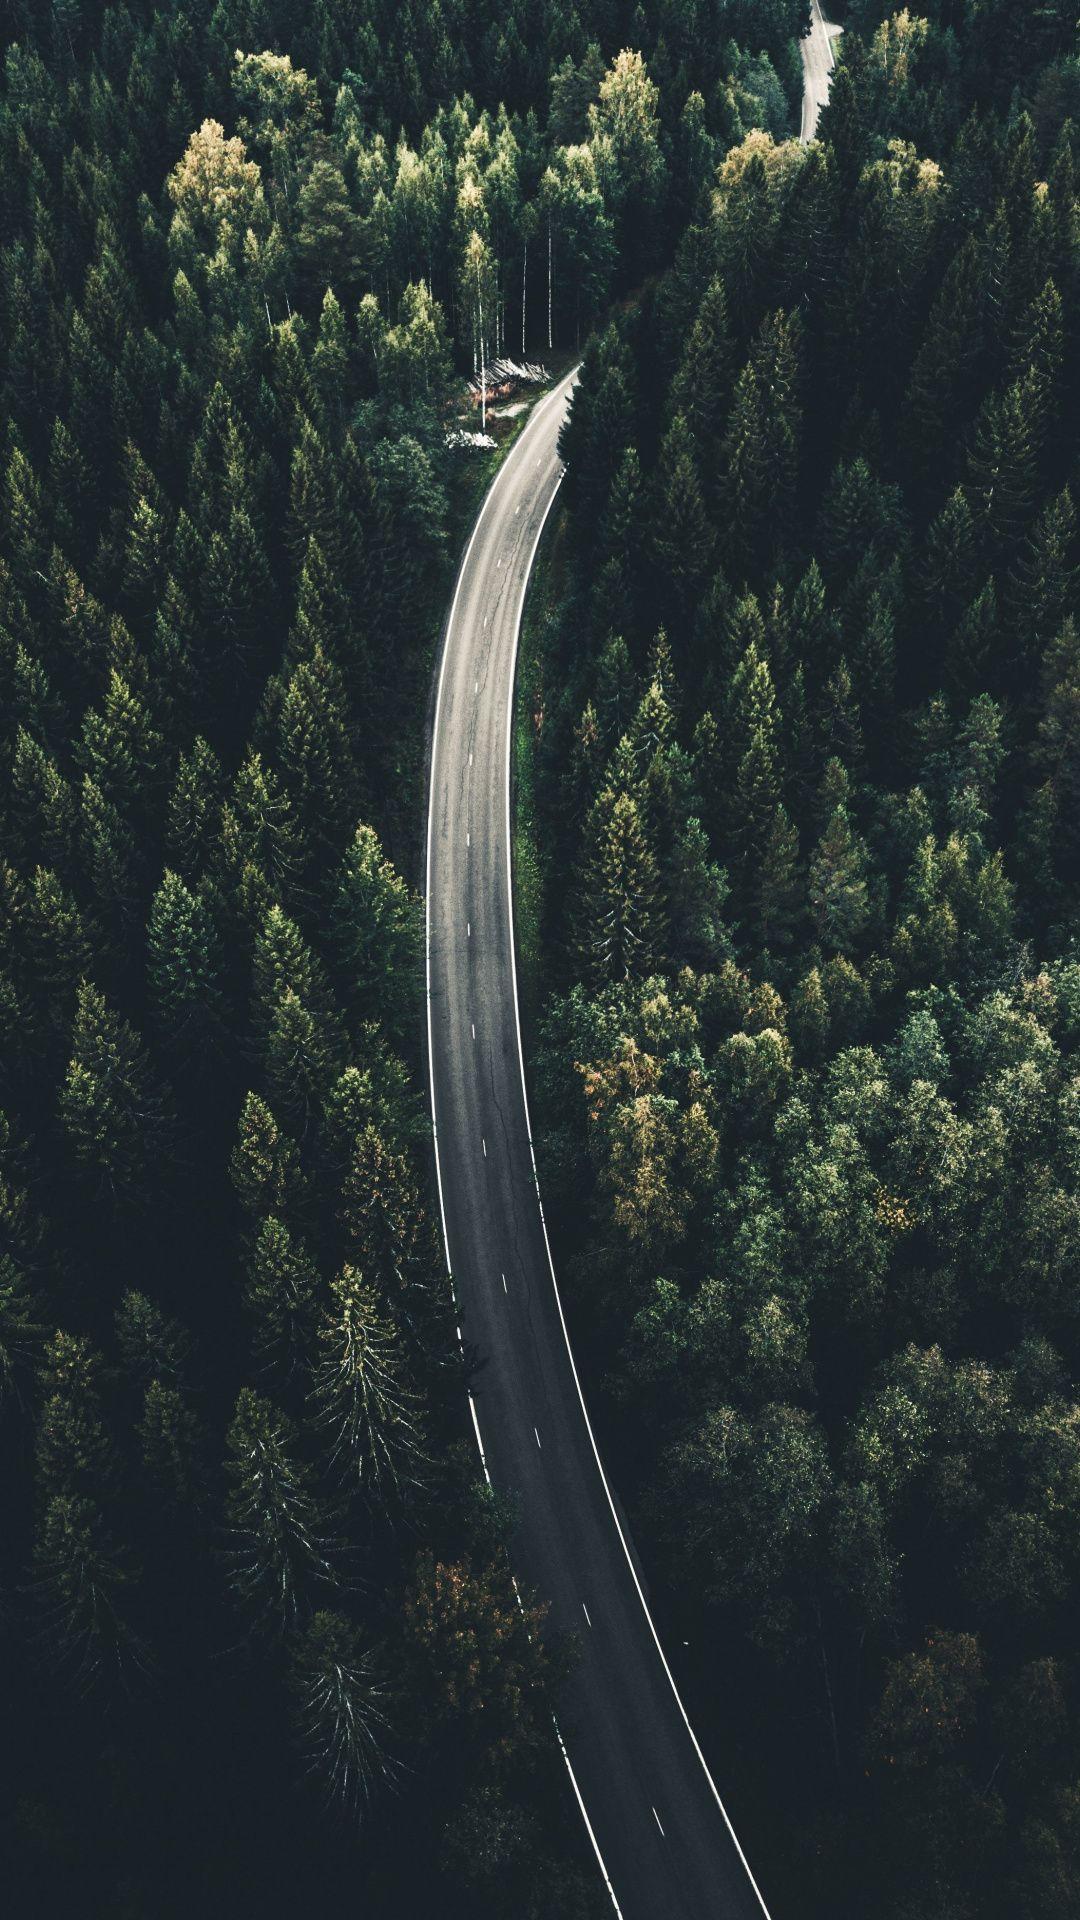 Viitailantie 269 Highway Aerial View Finland 1080x1920 Wallpaper Photo Instagram Unsplash Hd wallpaper mountain road aerial view